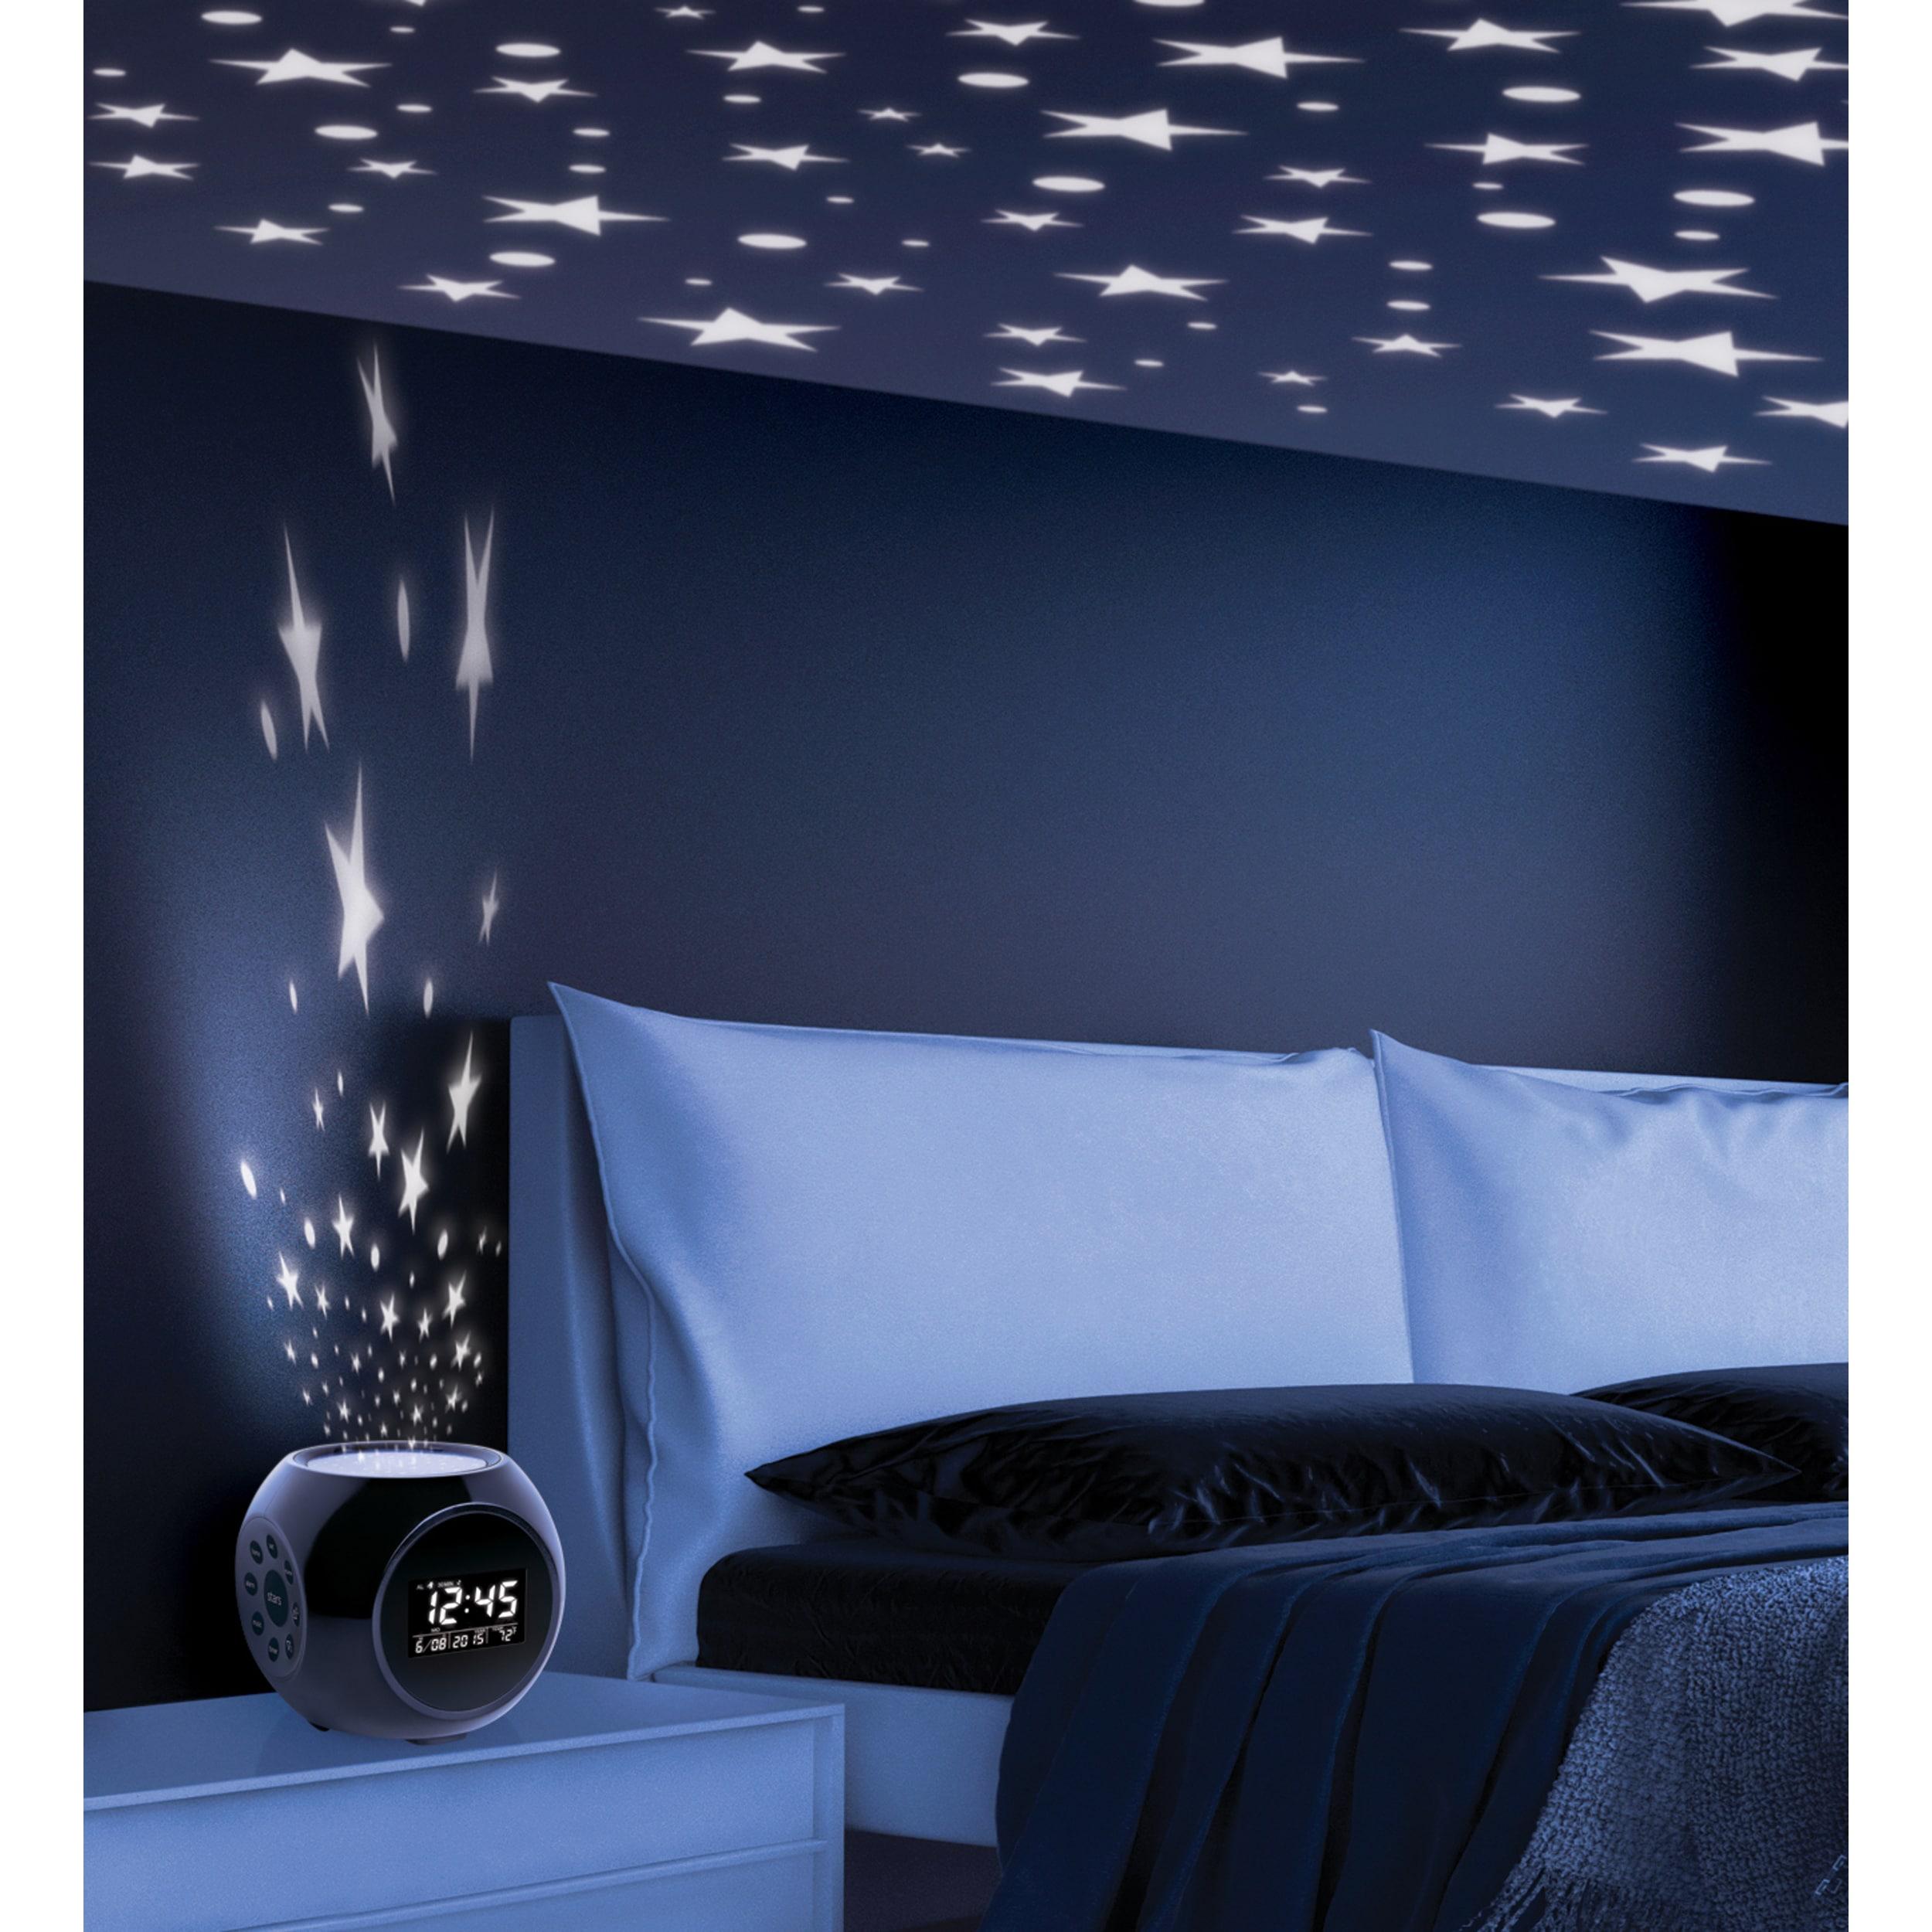 Shop Sharper Image Sound Machine Projection Alarm Clock Free